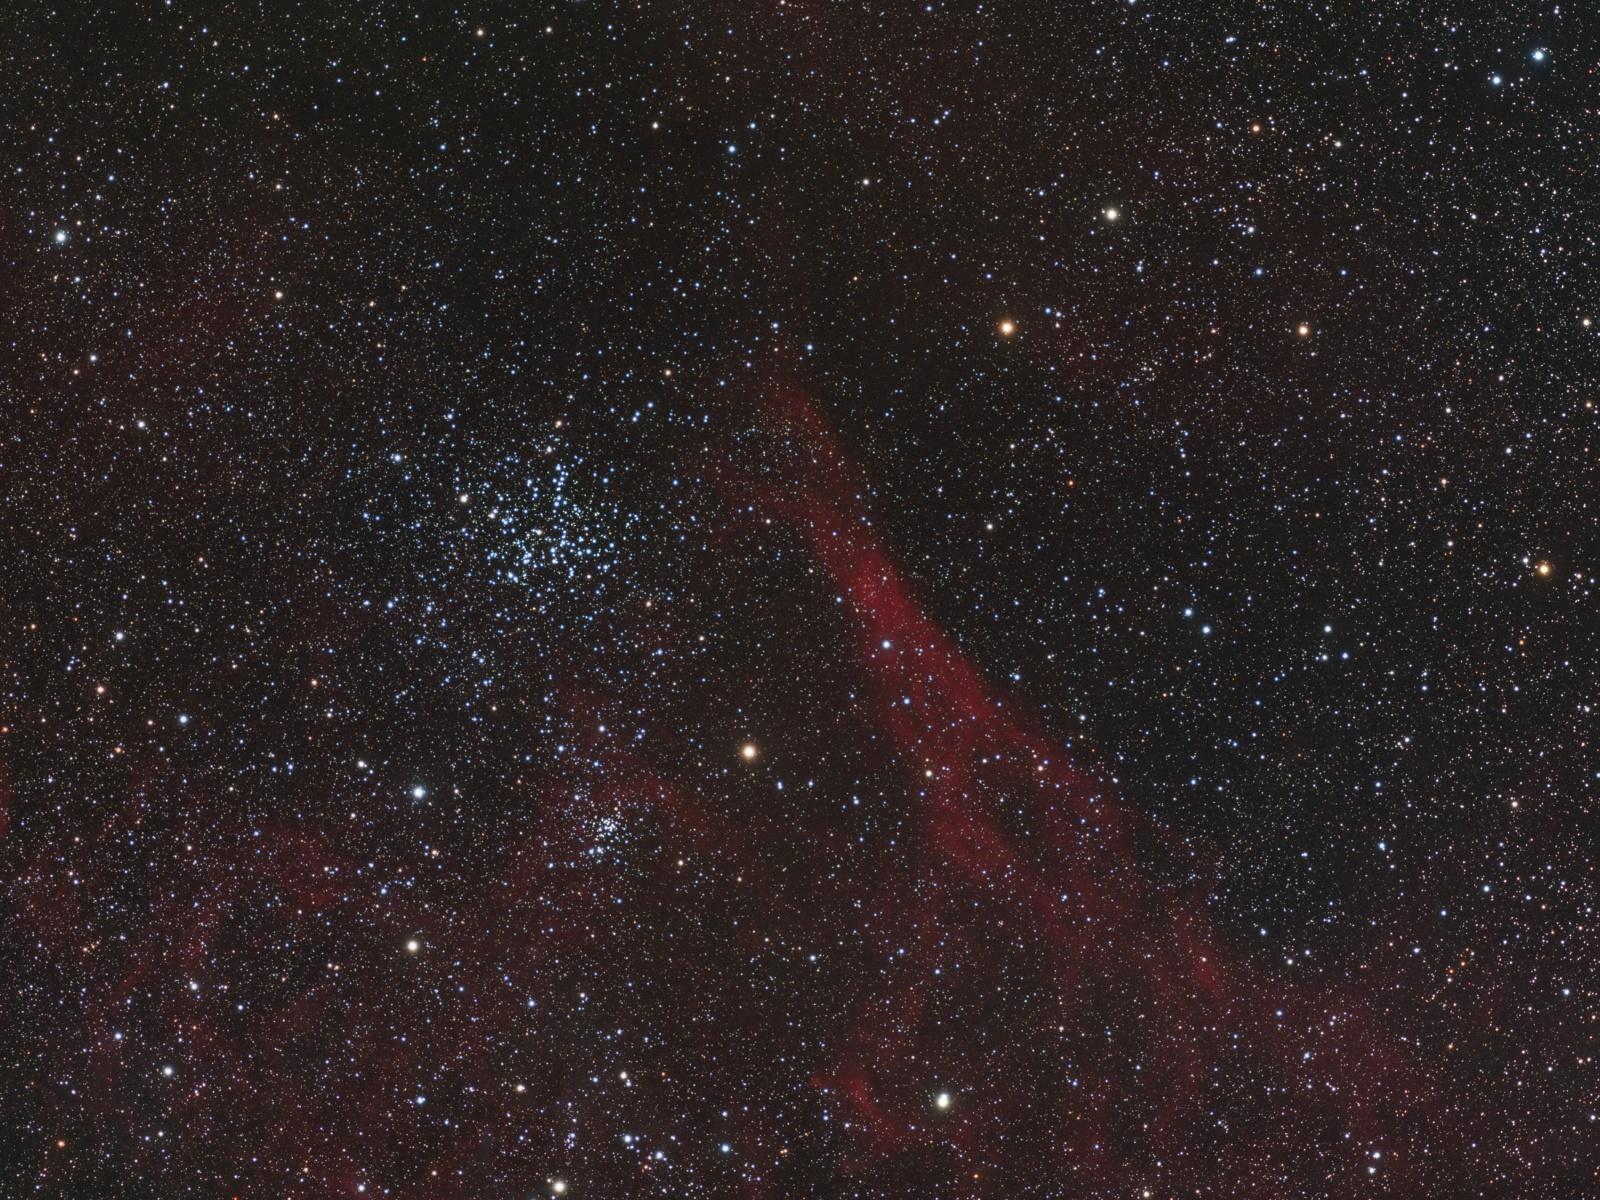 M38around_2021_rgb.thumb.jpg.bf0f8c0531f061588fd4dafe5b2aa3c6.jpg